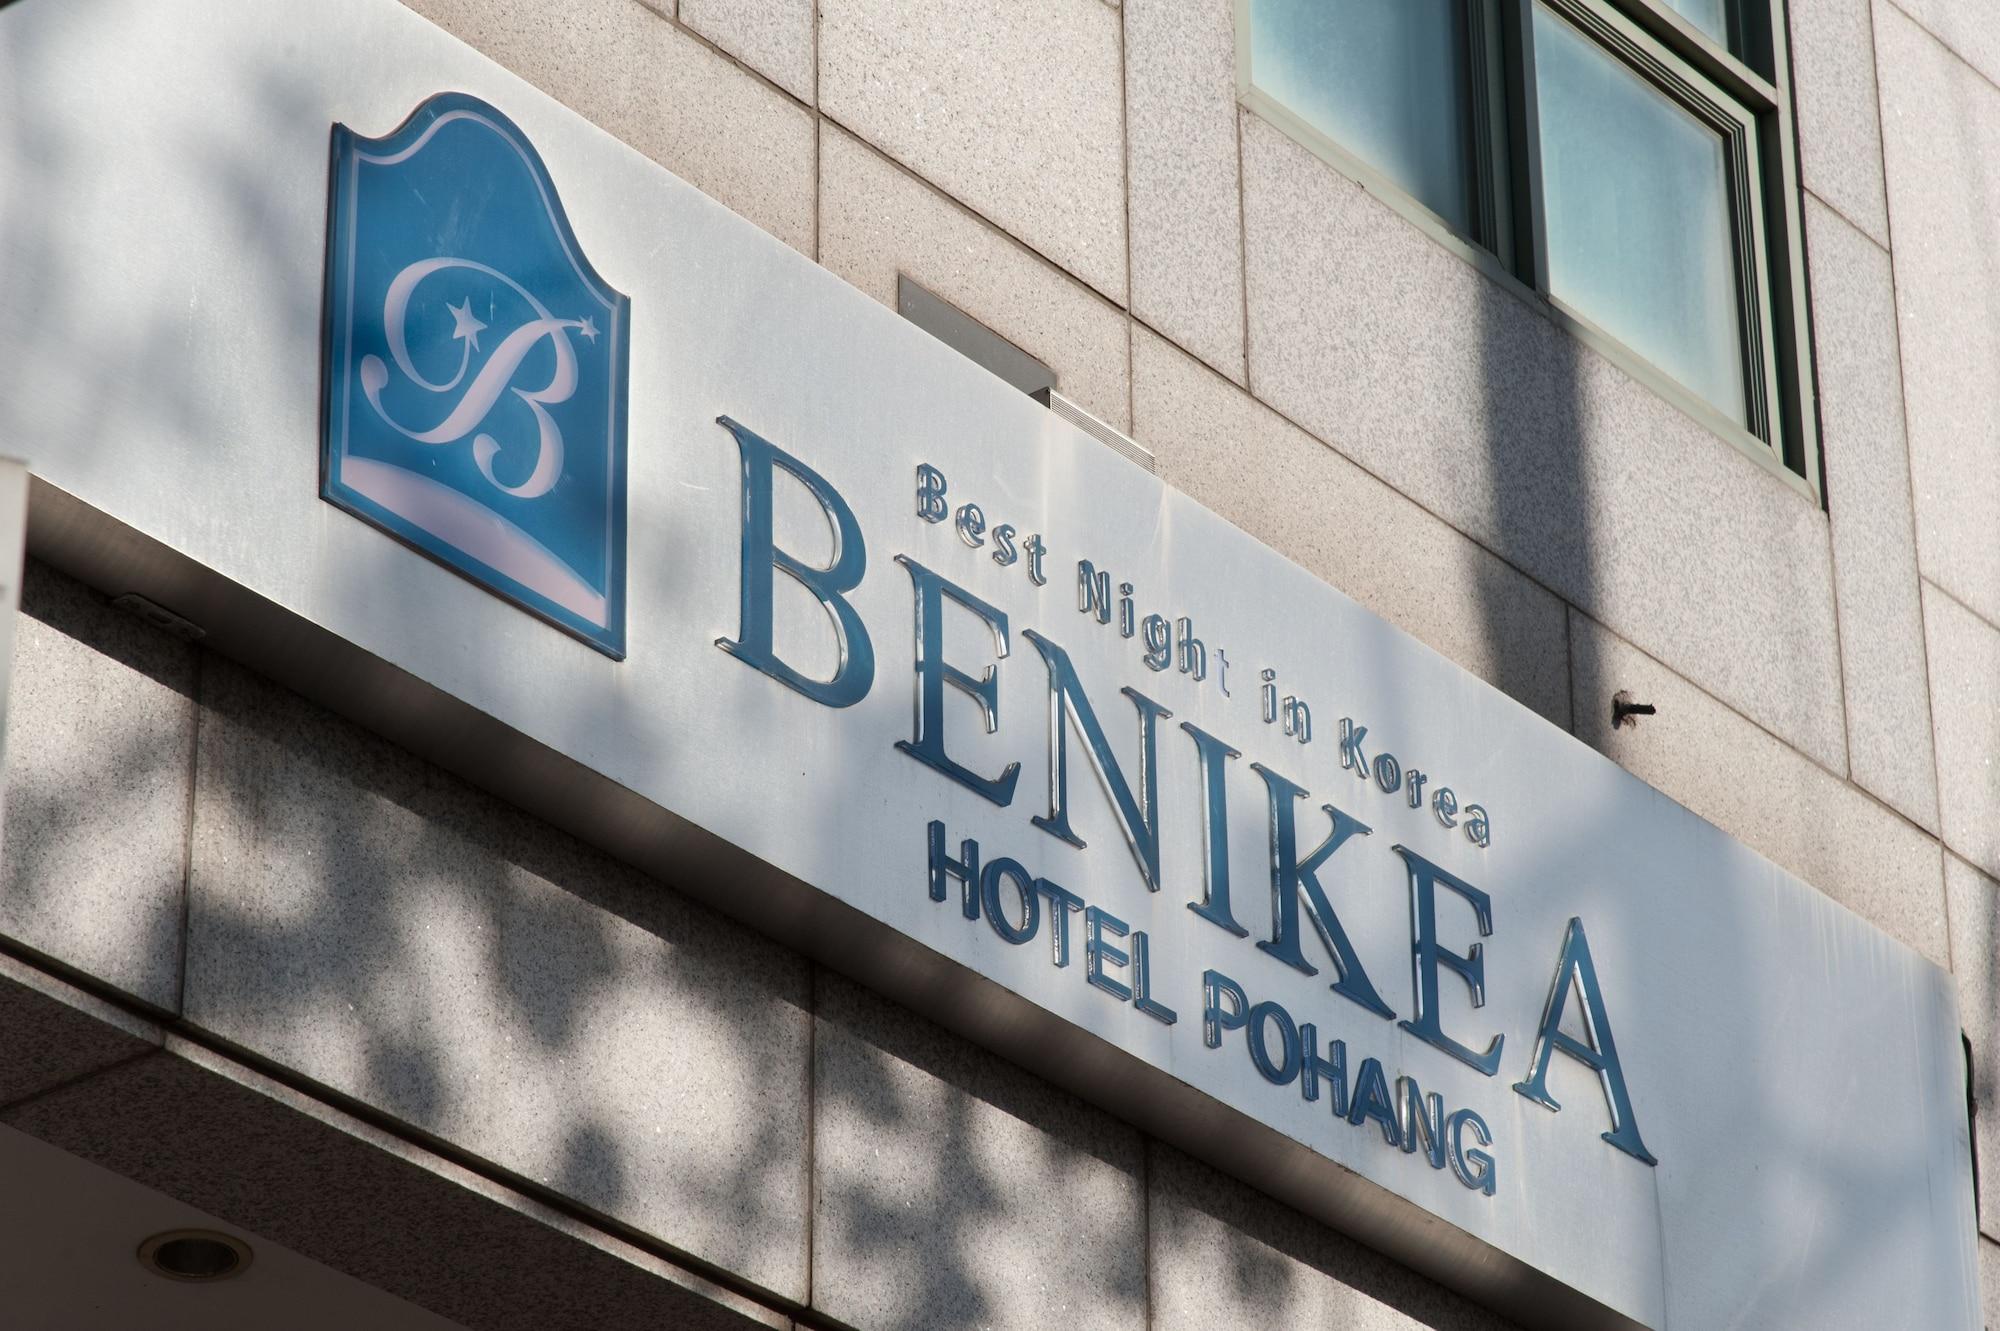 Benikea Hotel Pohang, Pohang